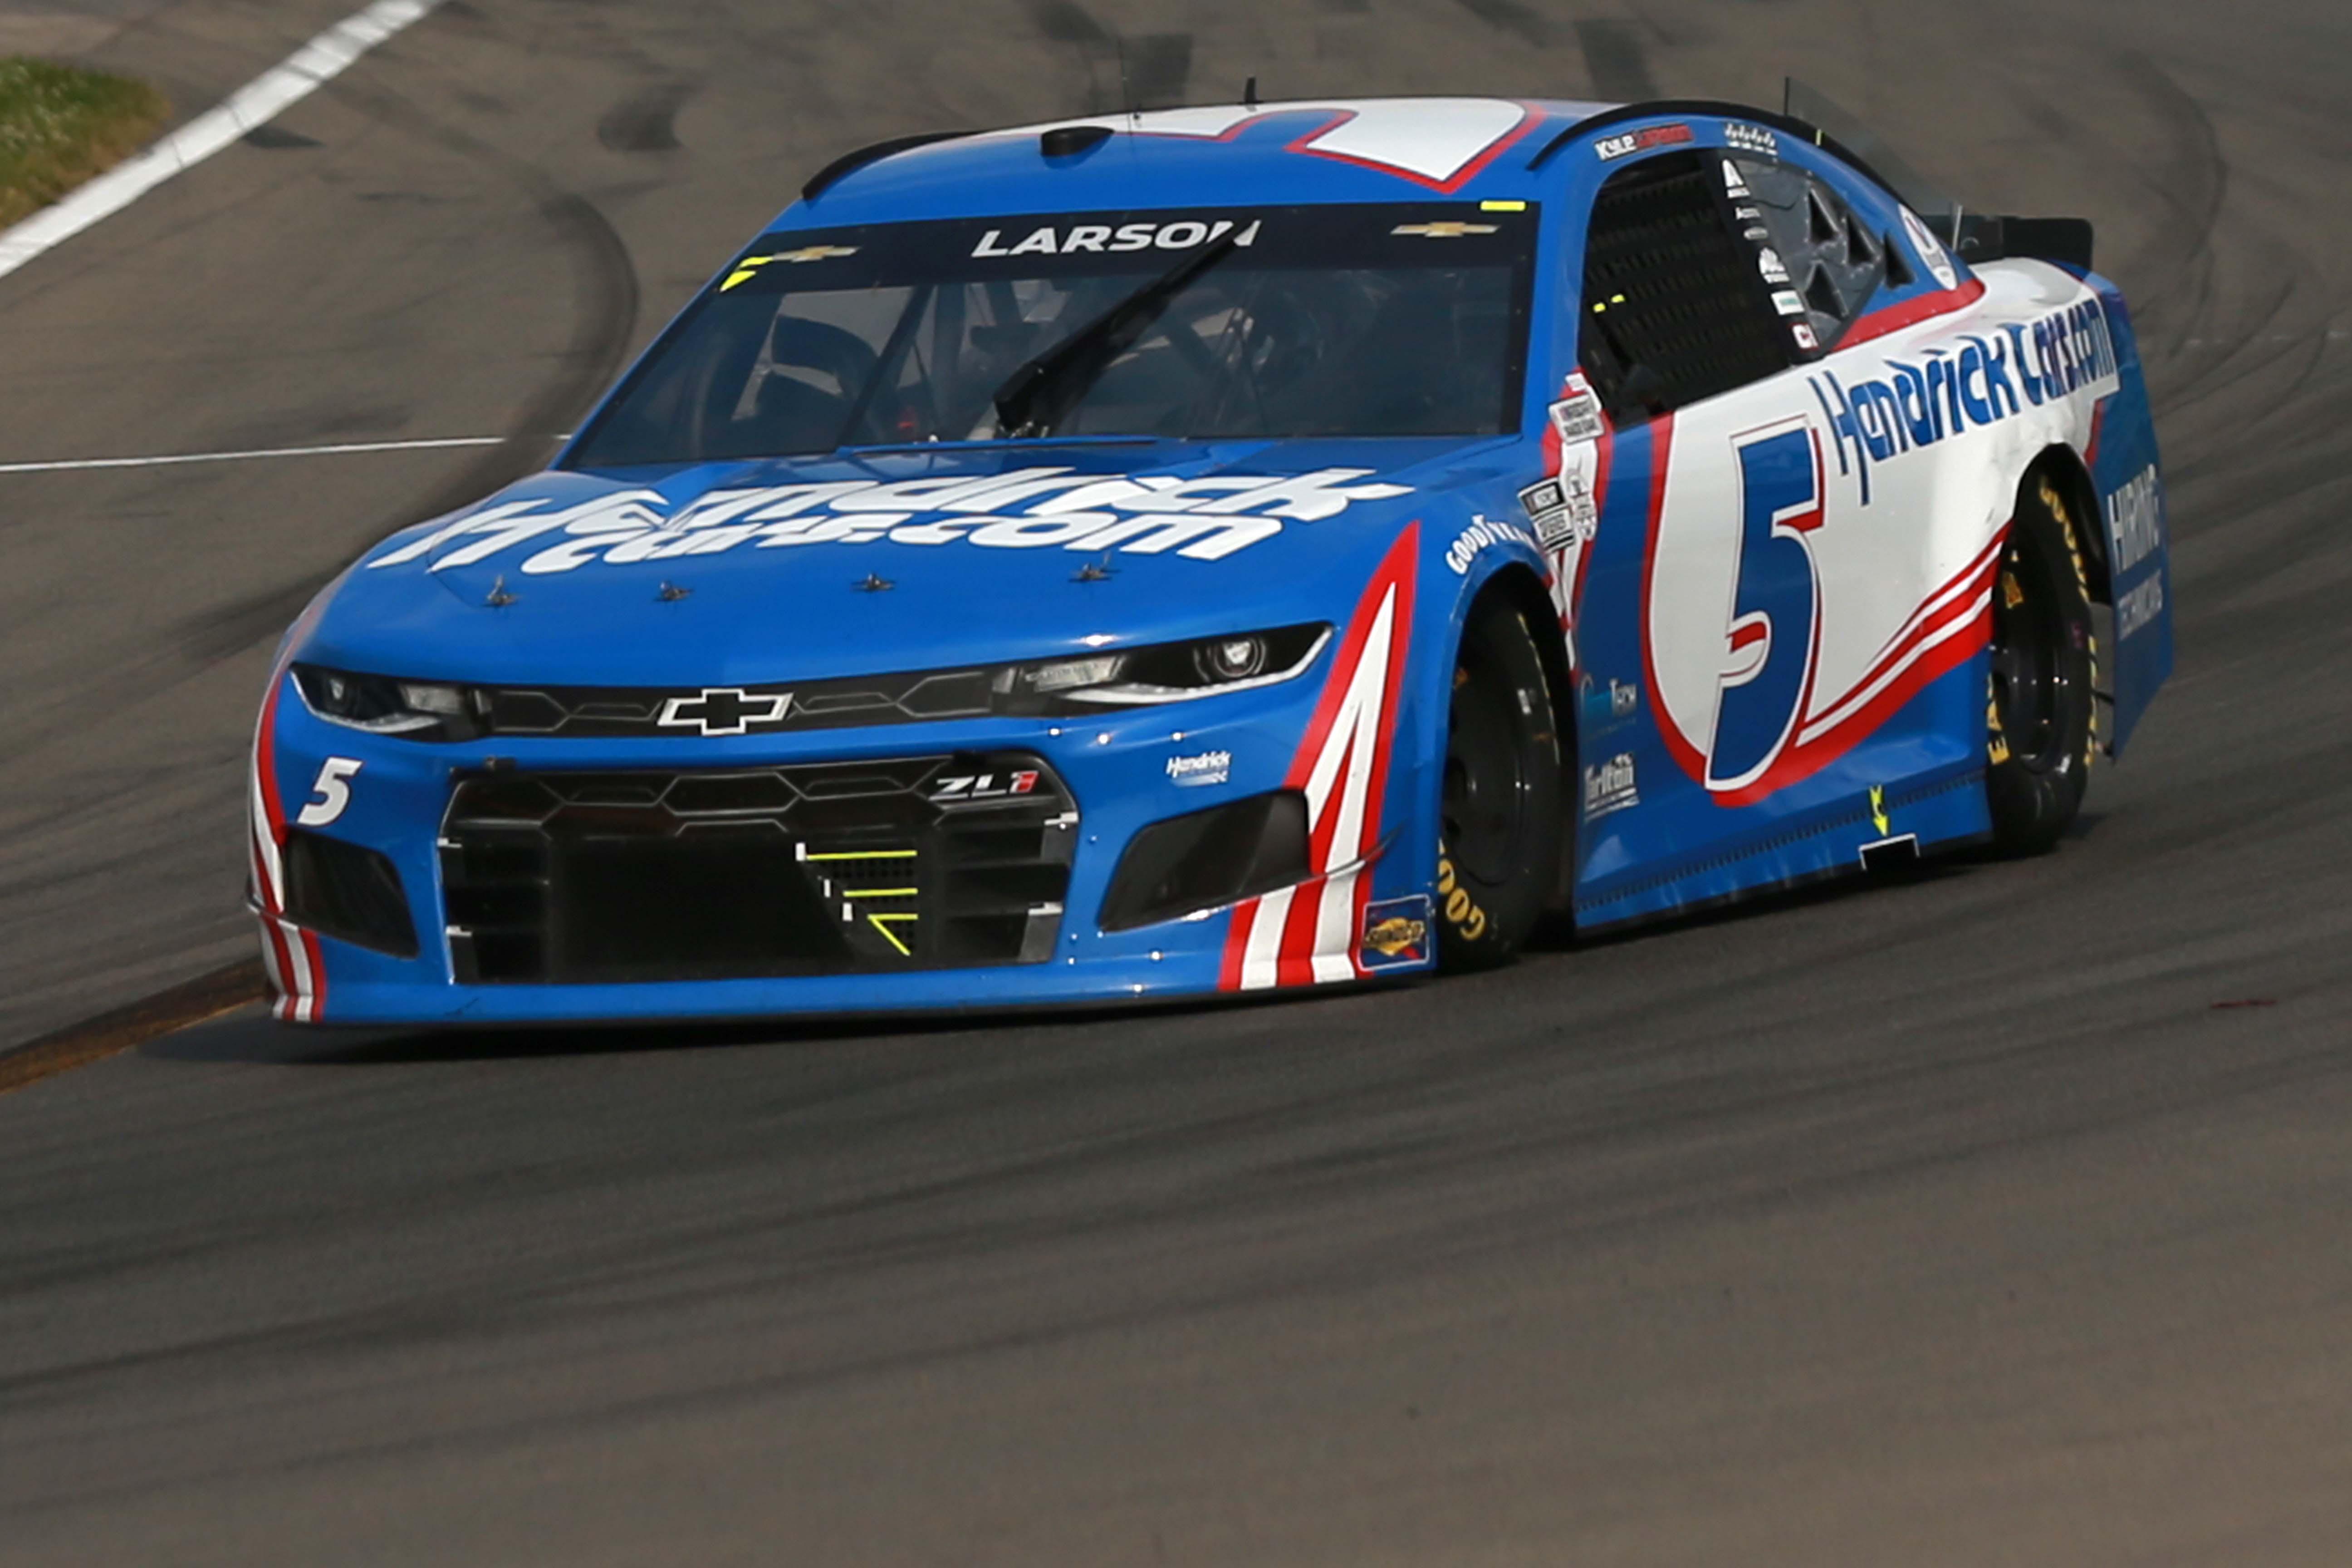 Kyle Larson 5 at Watkins Glen International - NASCAR Cup Series